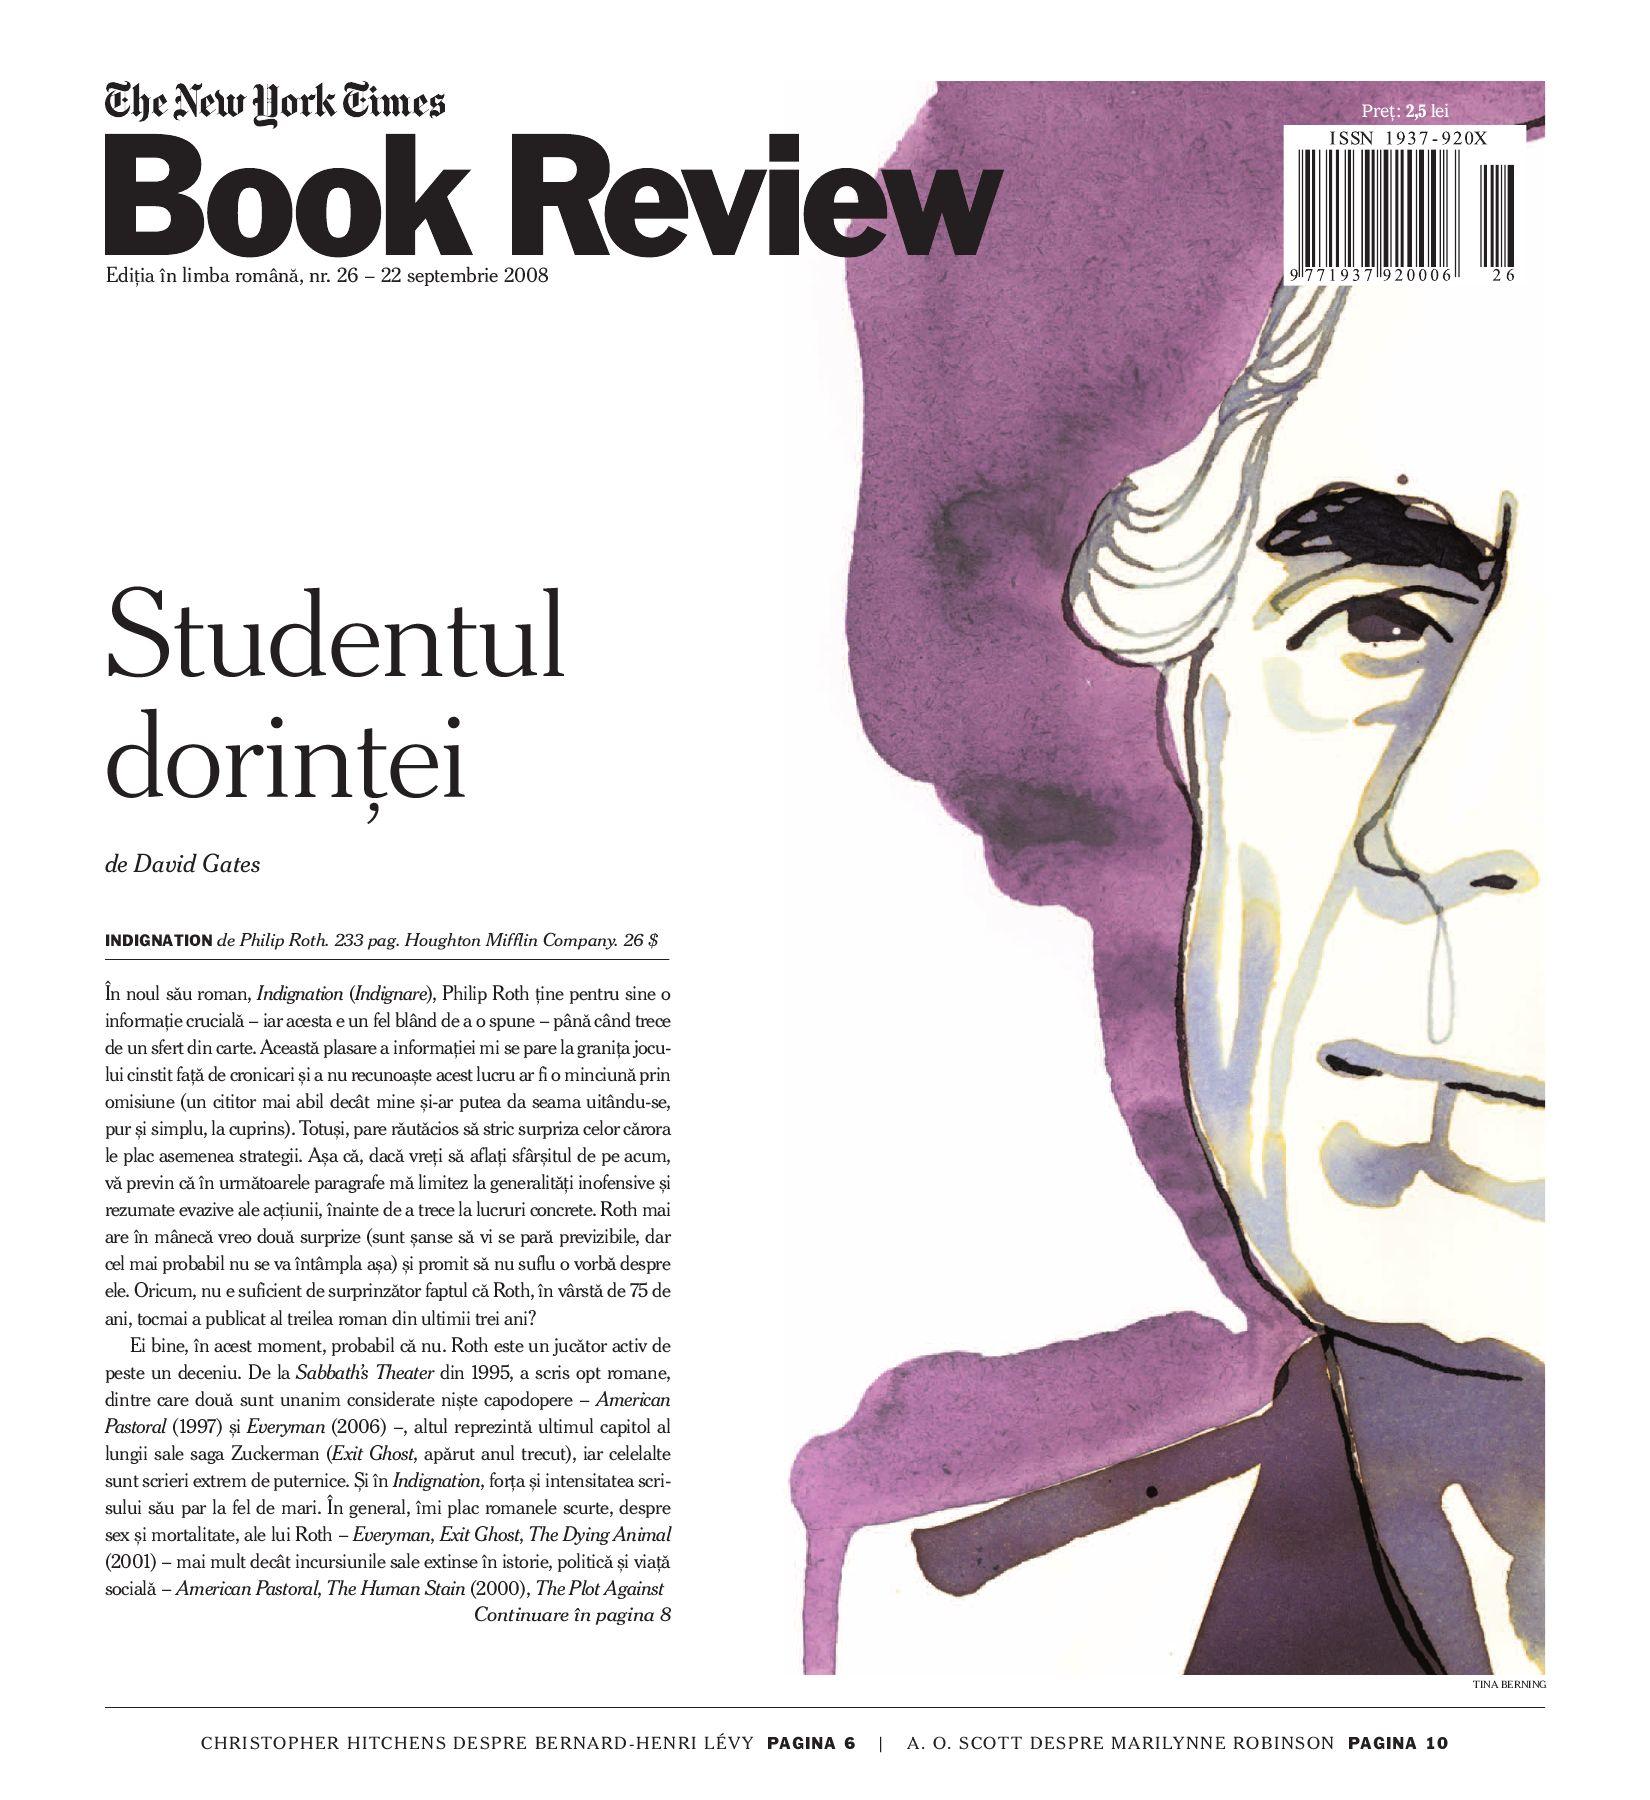 vânzări la cald disponibil magazin NYTBR 26 | 22 septembrie 2008 by Editura Univers - issuu